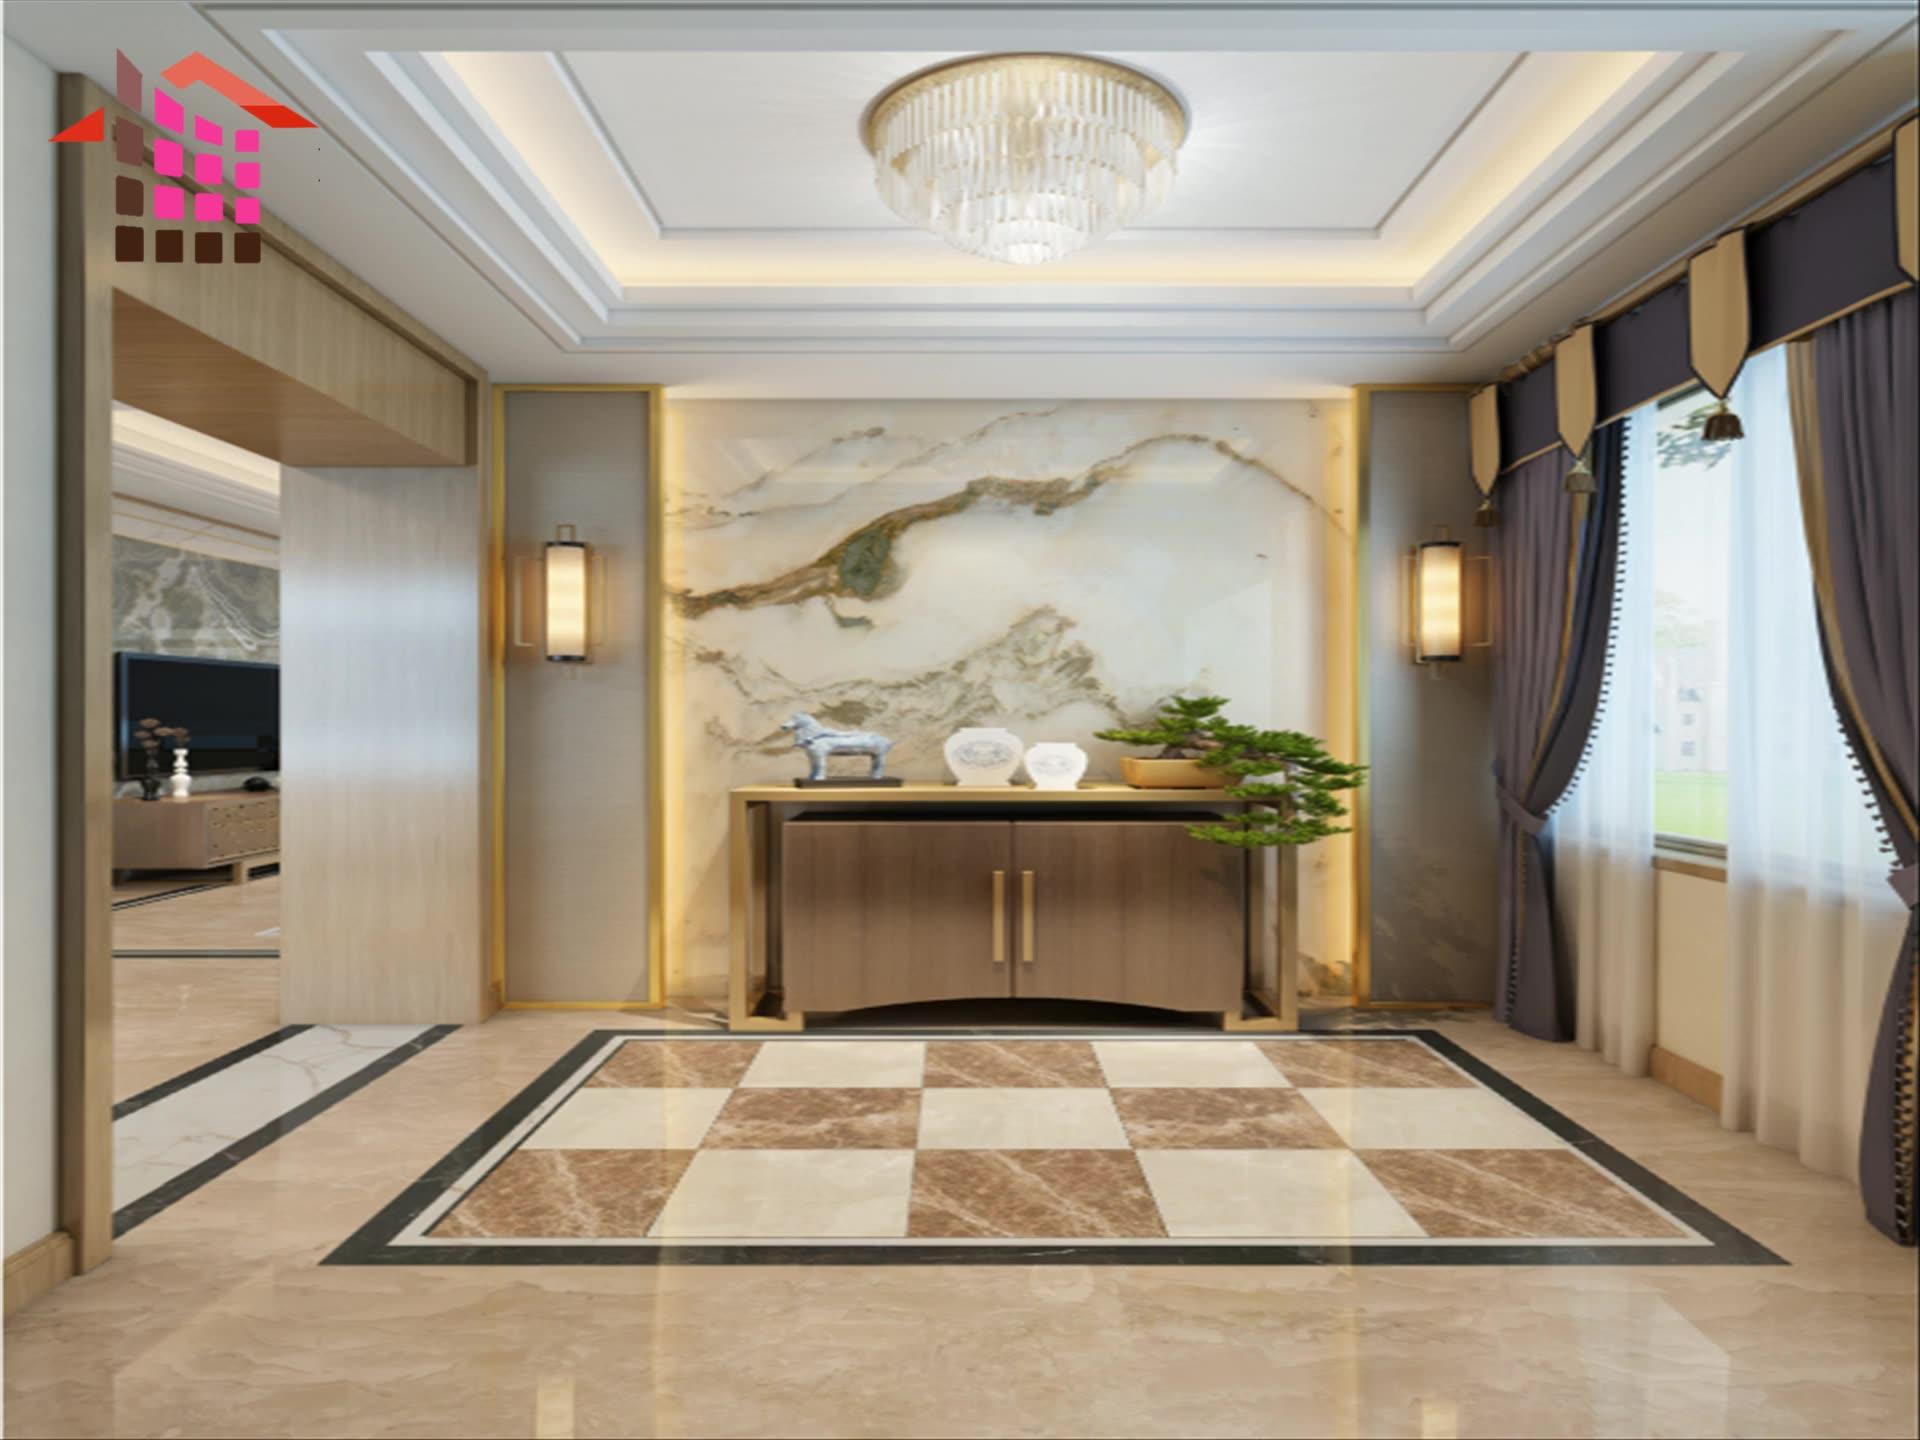 Natural Marble Flooring Marble Design Italian Marble Flooring Pieces Chinese Buy Marble Flooring Tiles And Marbles Floor Marble Flooring Border Designs Floor Tiles Marble Italian Marble Marble Floor Tile Italy Marble Marble